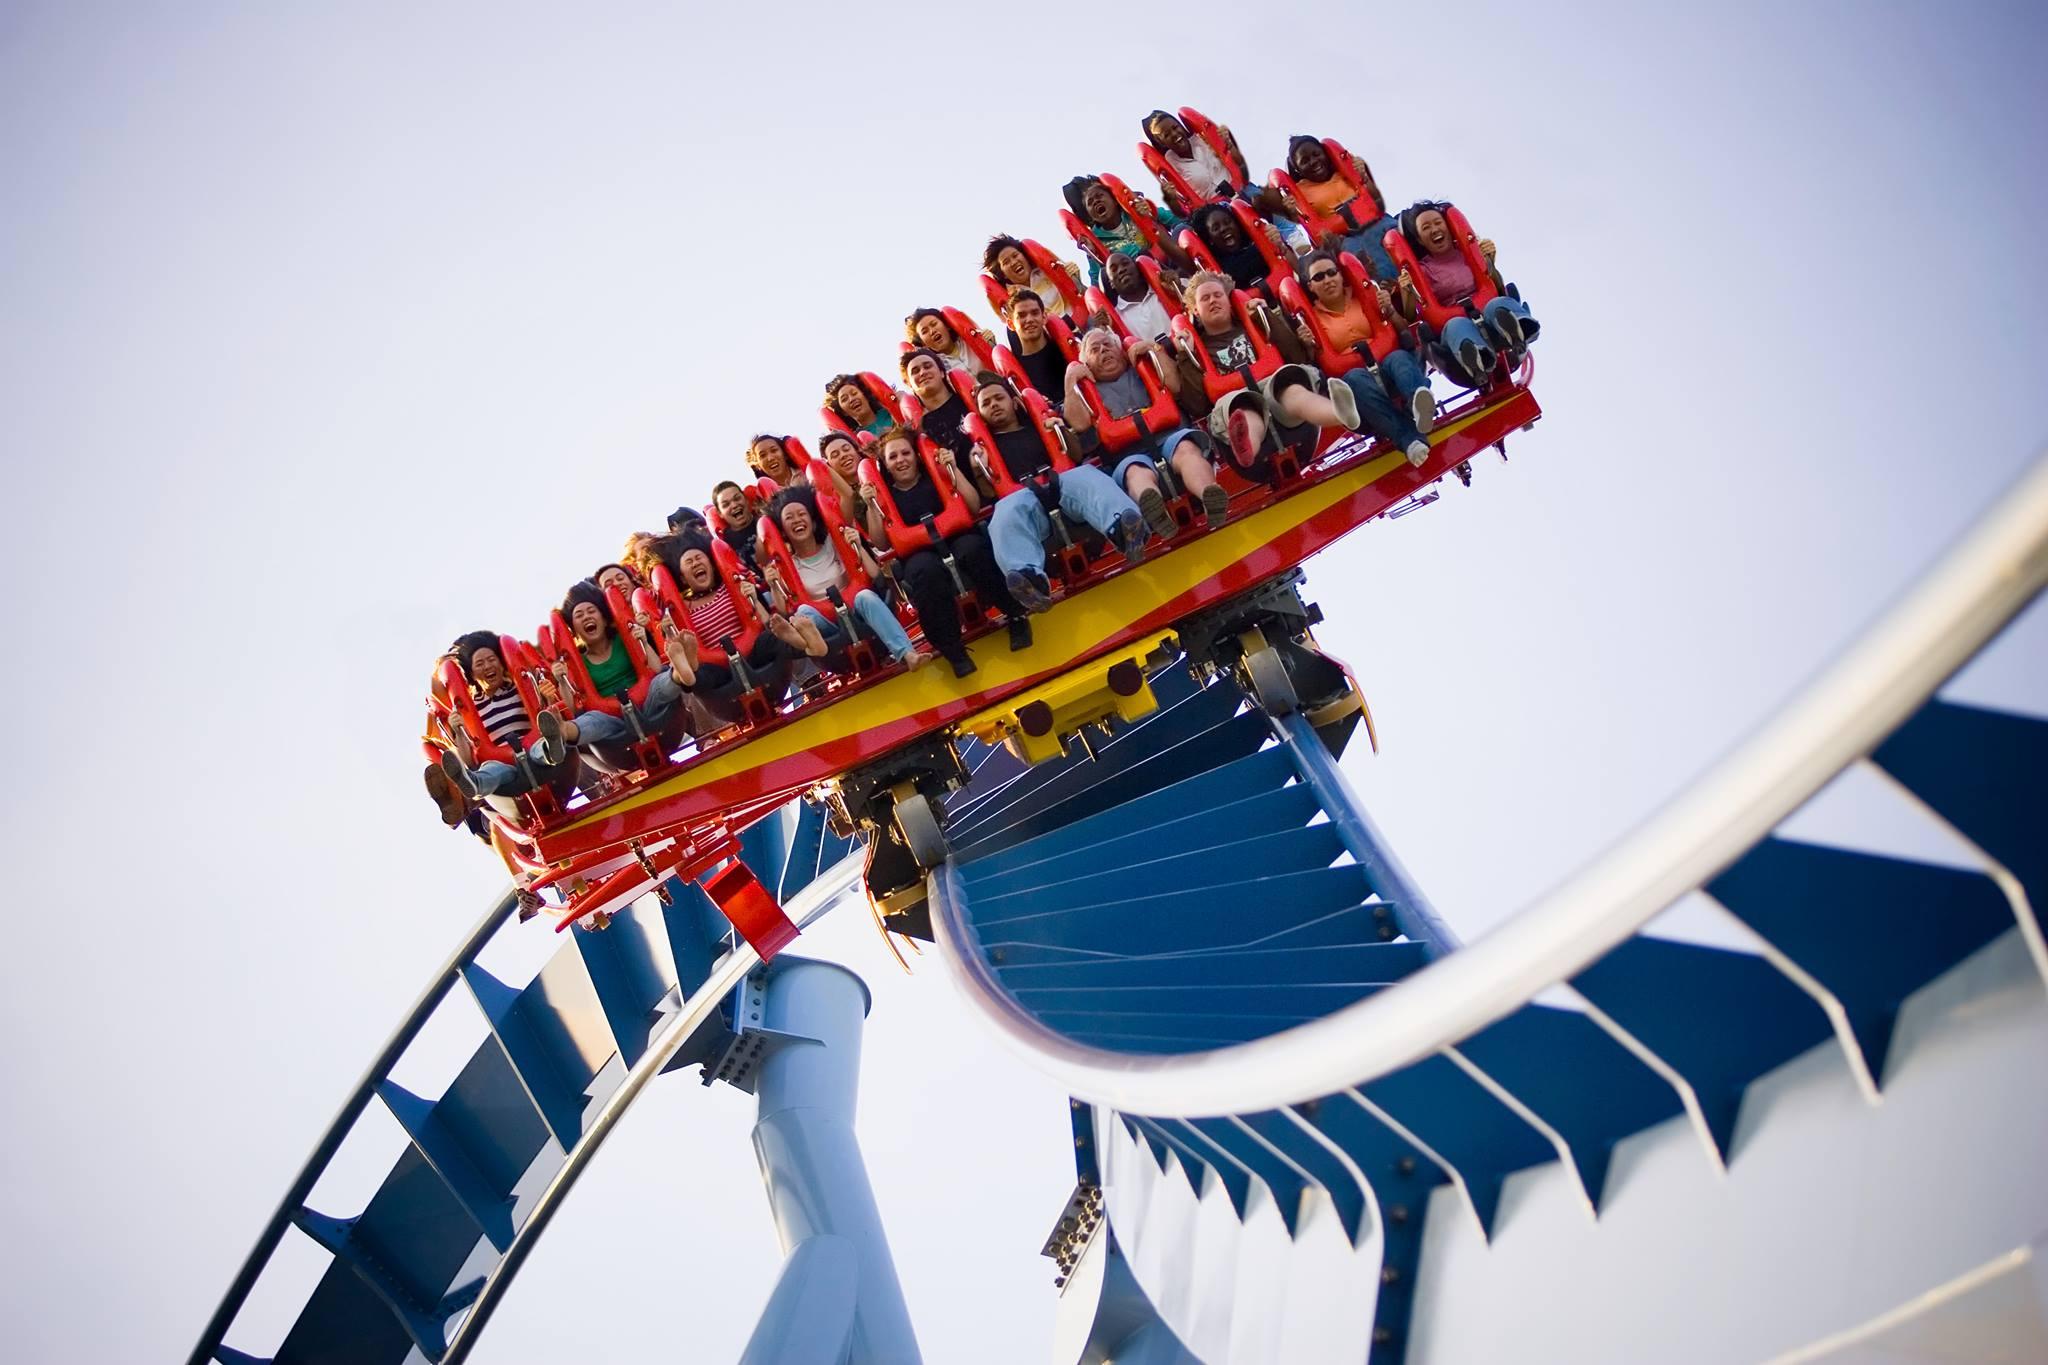 Busch Gardens Roller Coaster 2 Work and